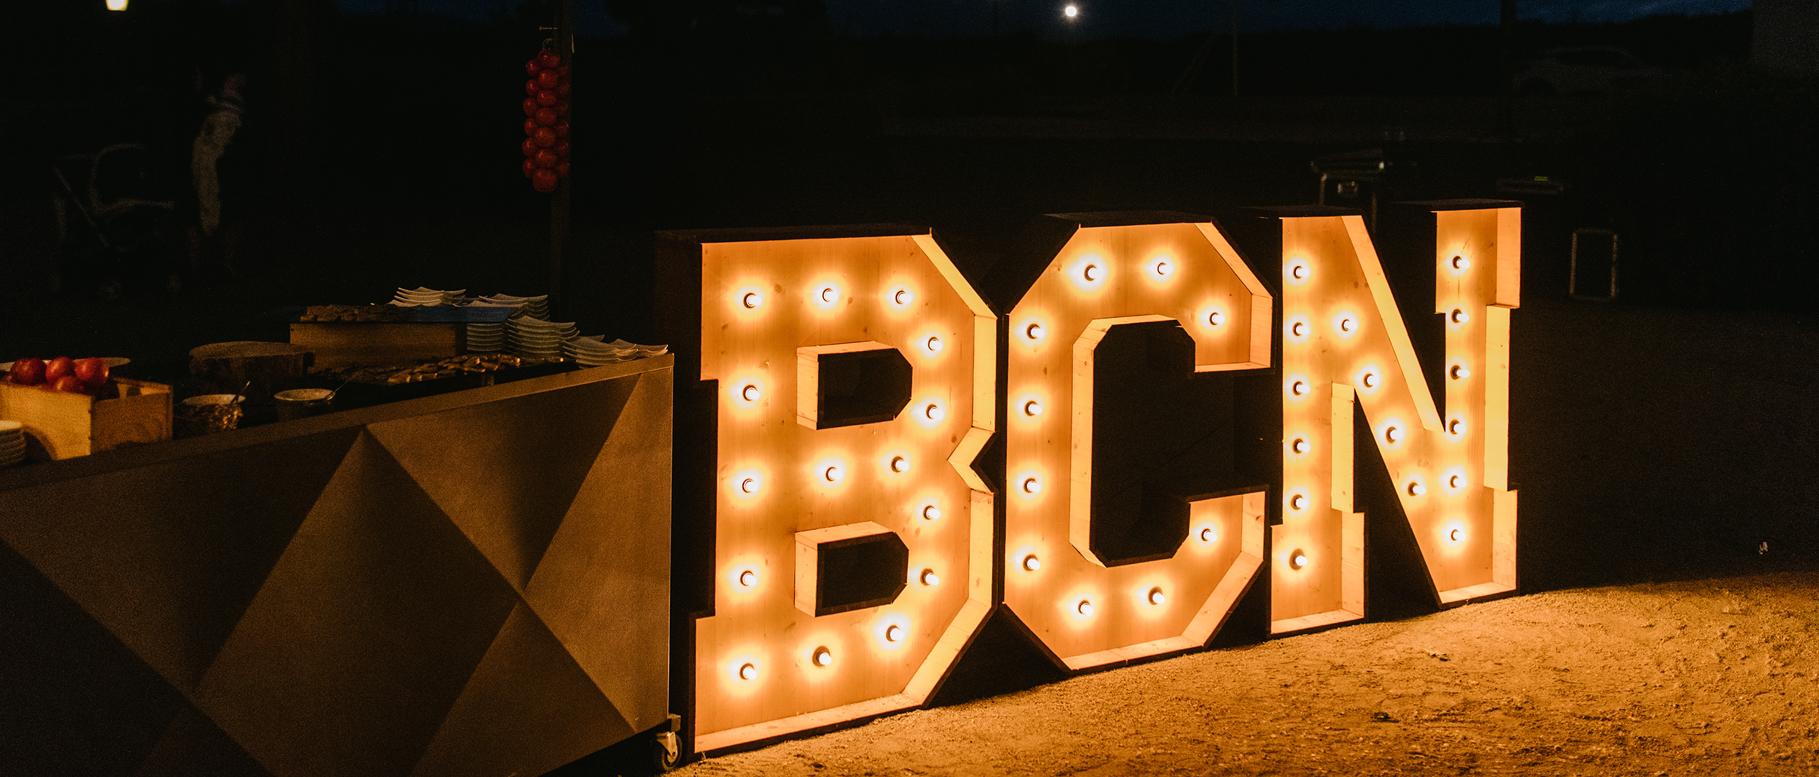 Alquiler de letras luminosas para eventos Barcelona - BCN LETTERS